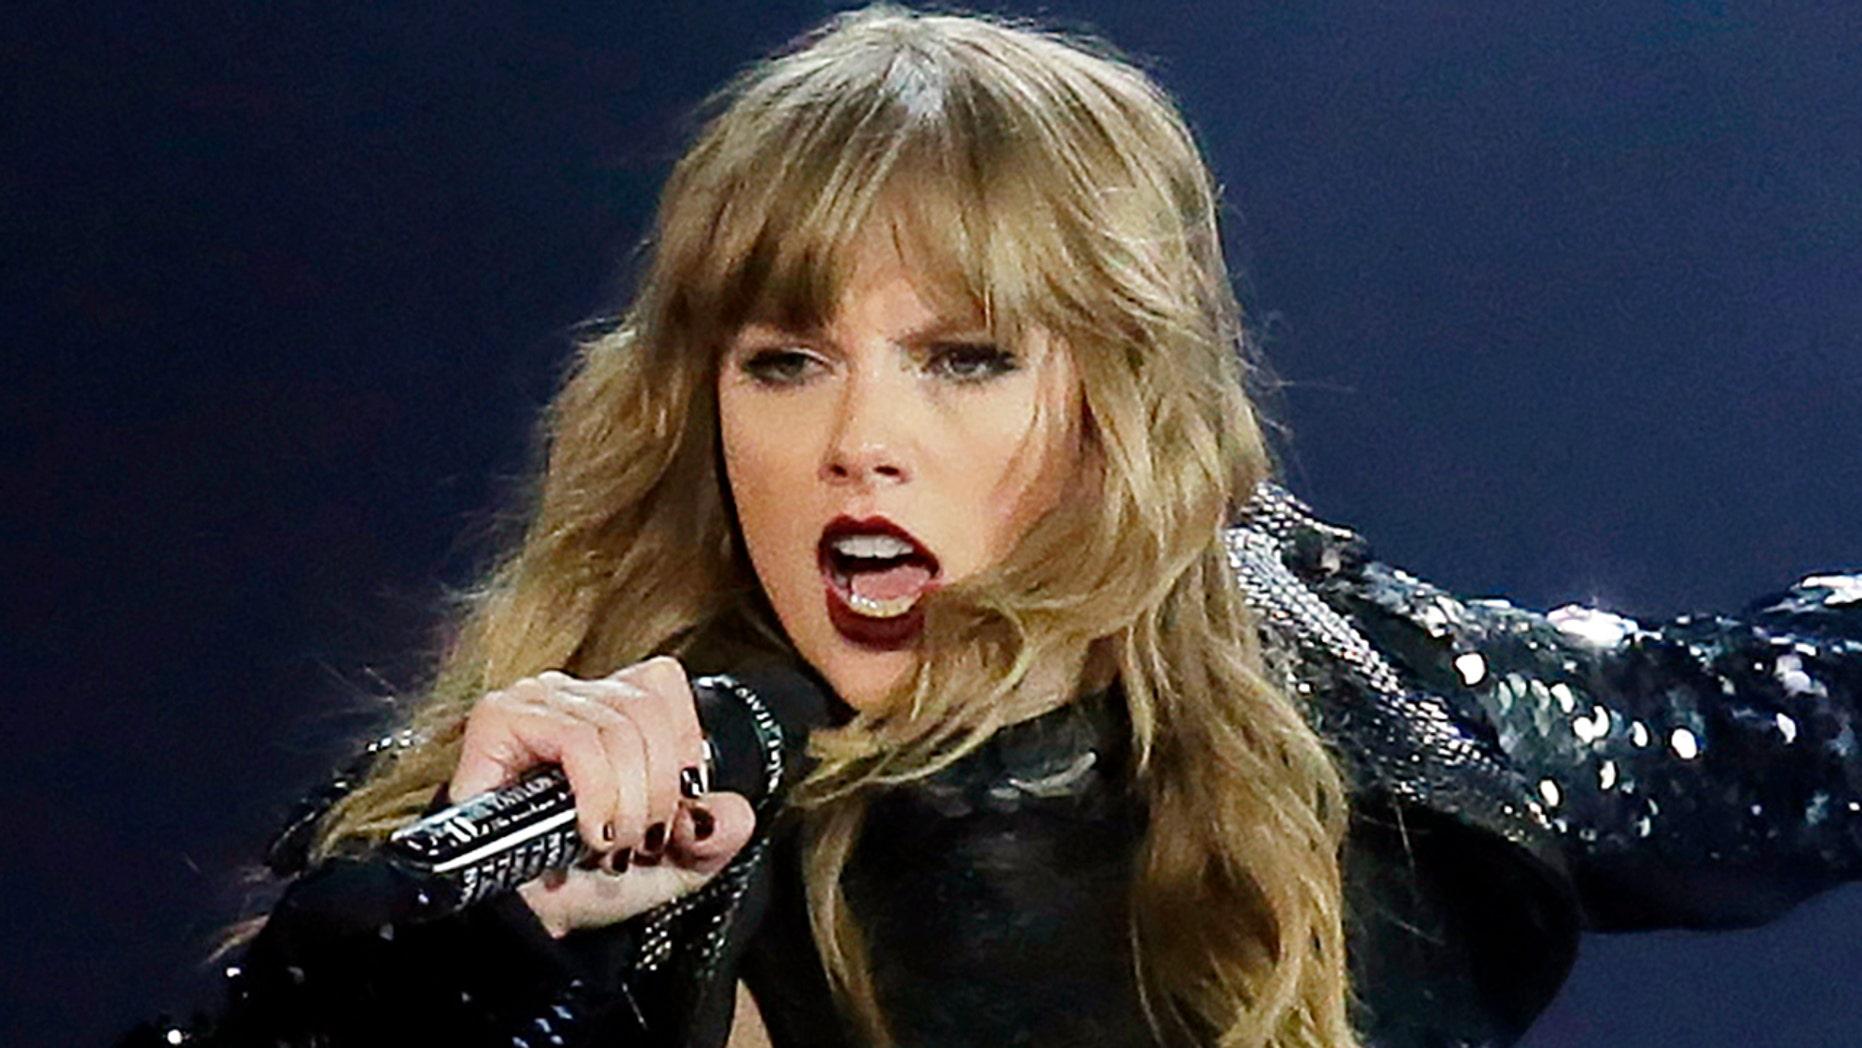 Taylor Swift performs during the Reputation Tour opener at University of Phoenix Stadium in Glendale, Arizona.